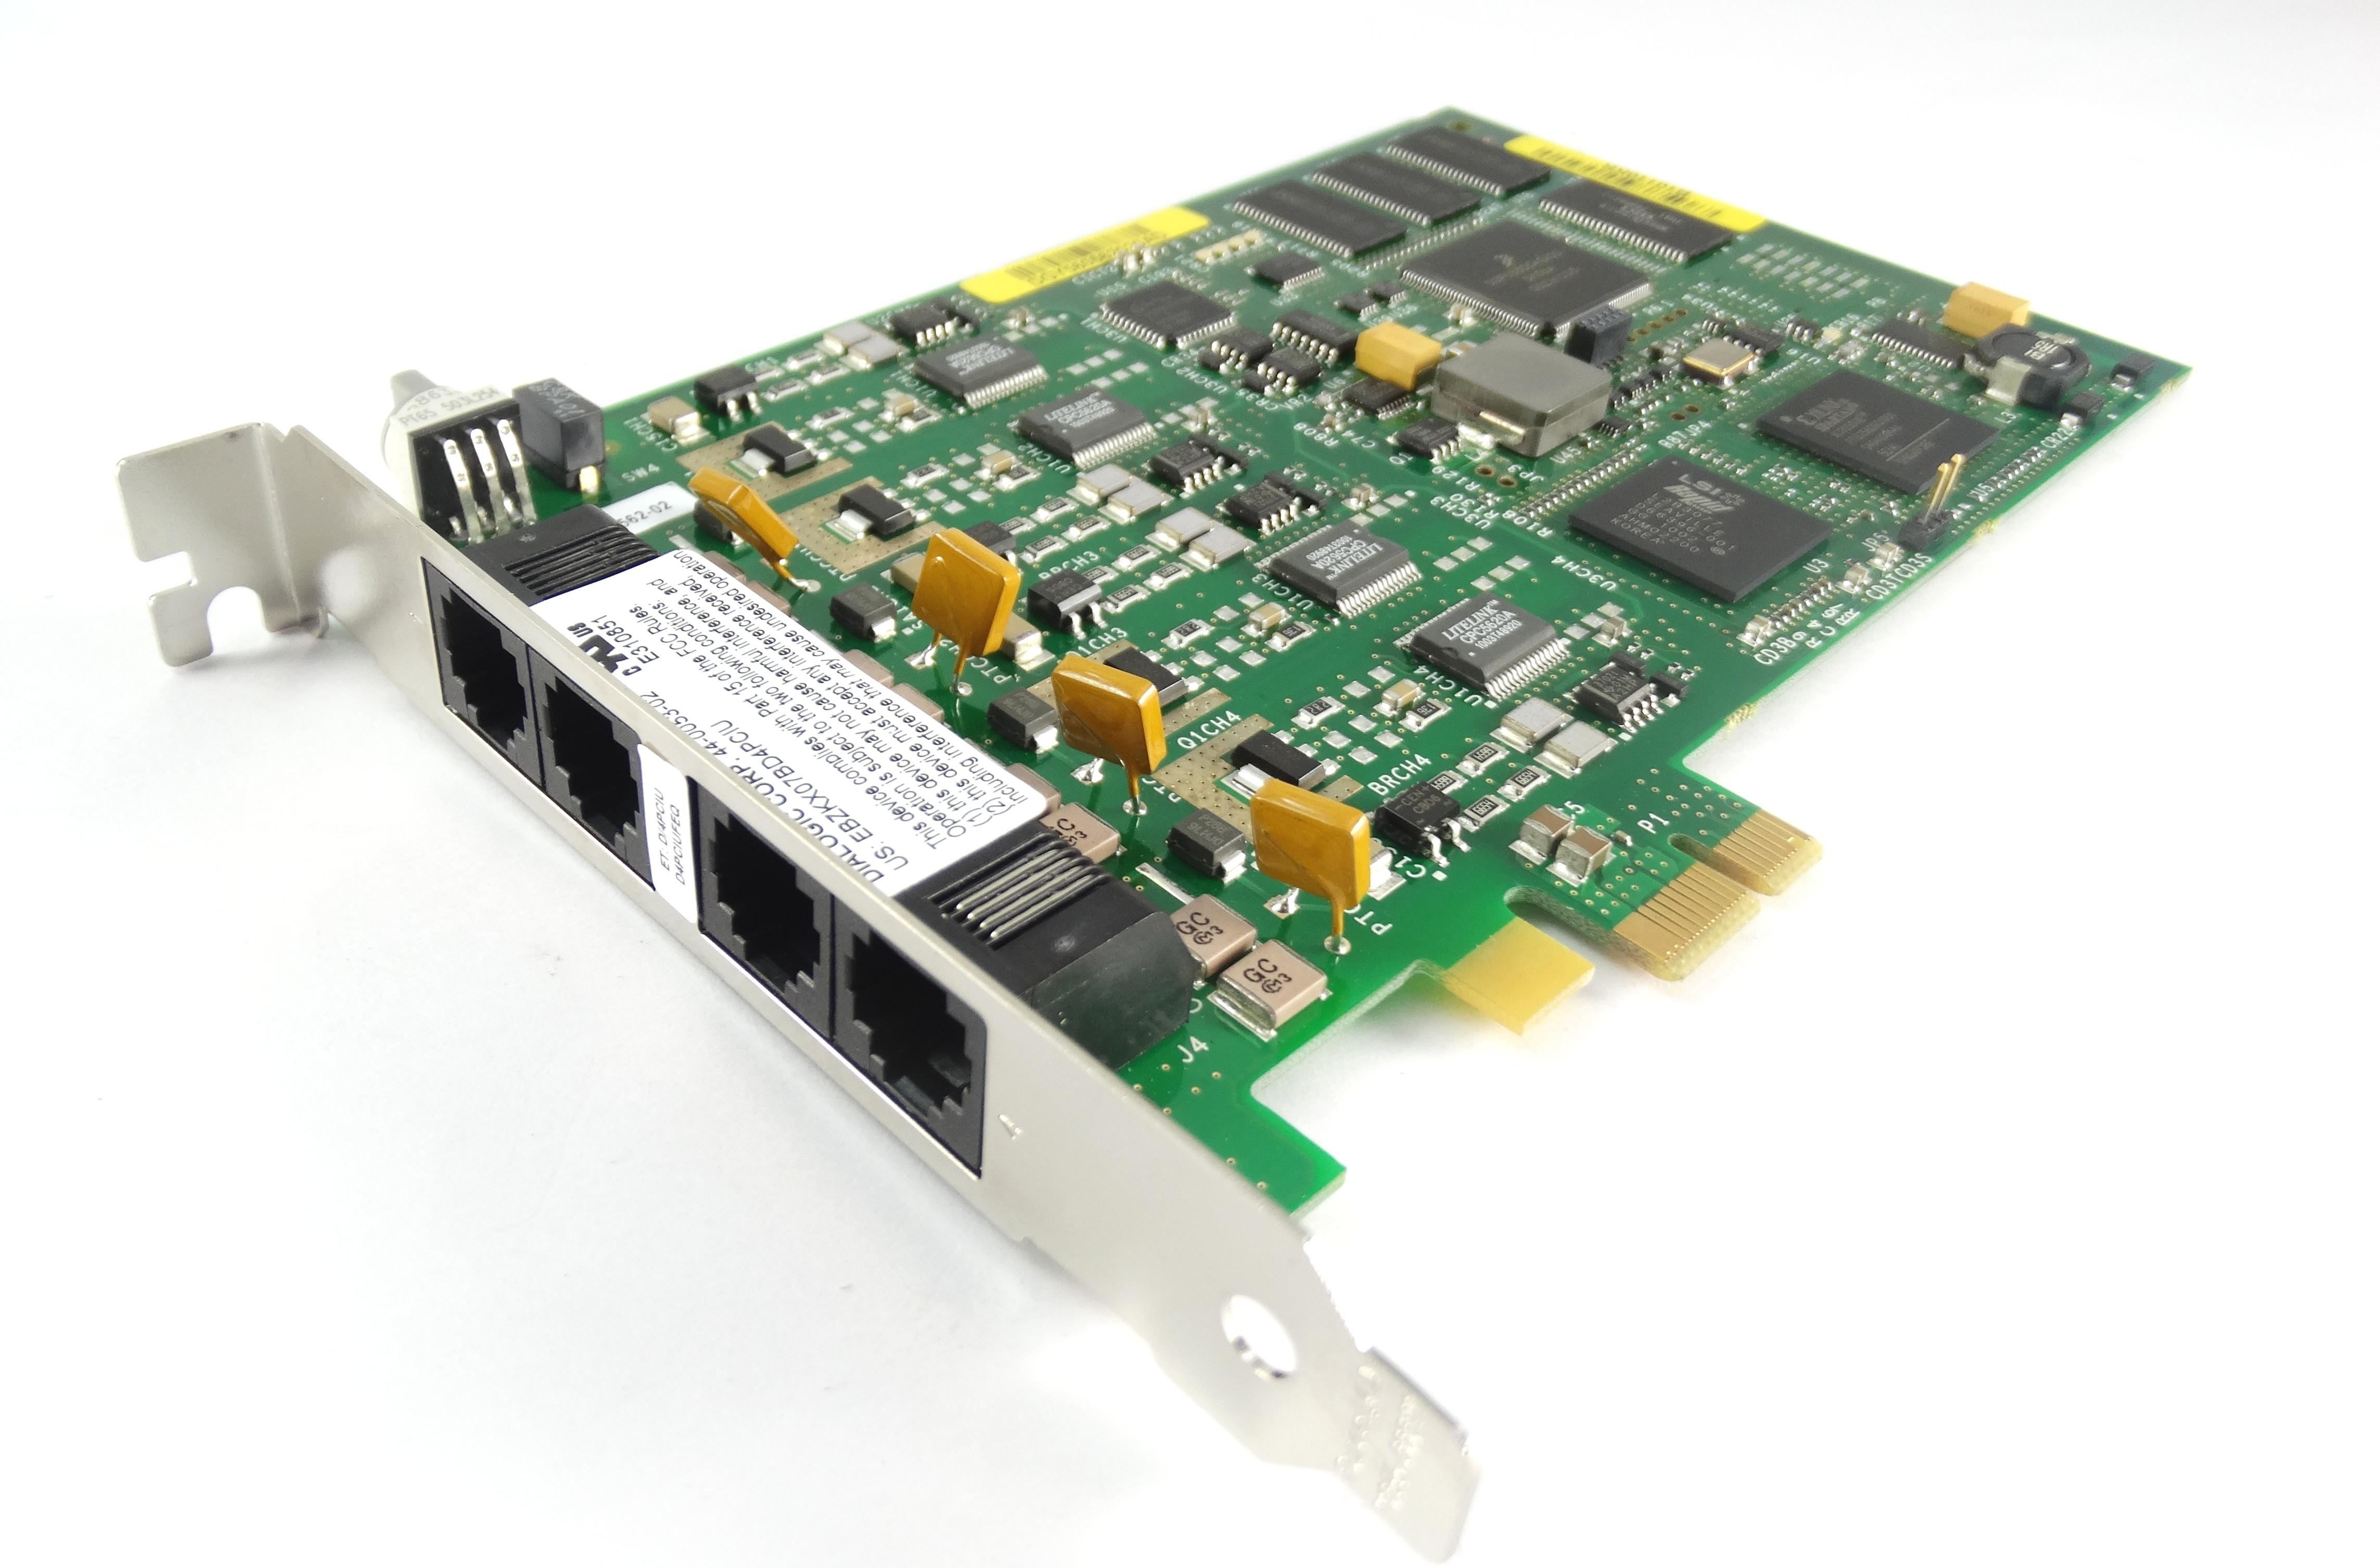 Dialogic A03-0017Jpa D4Pciufeq 4-Port Voice Network InterfAce Card (44-0053-02)